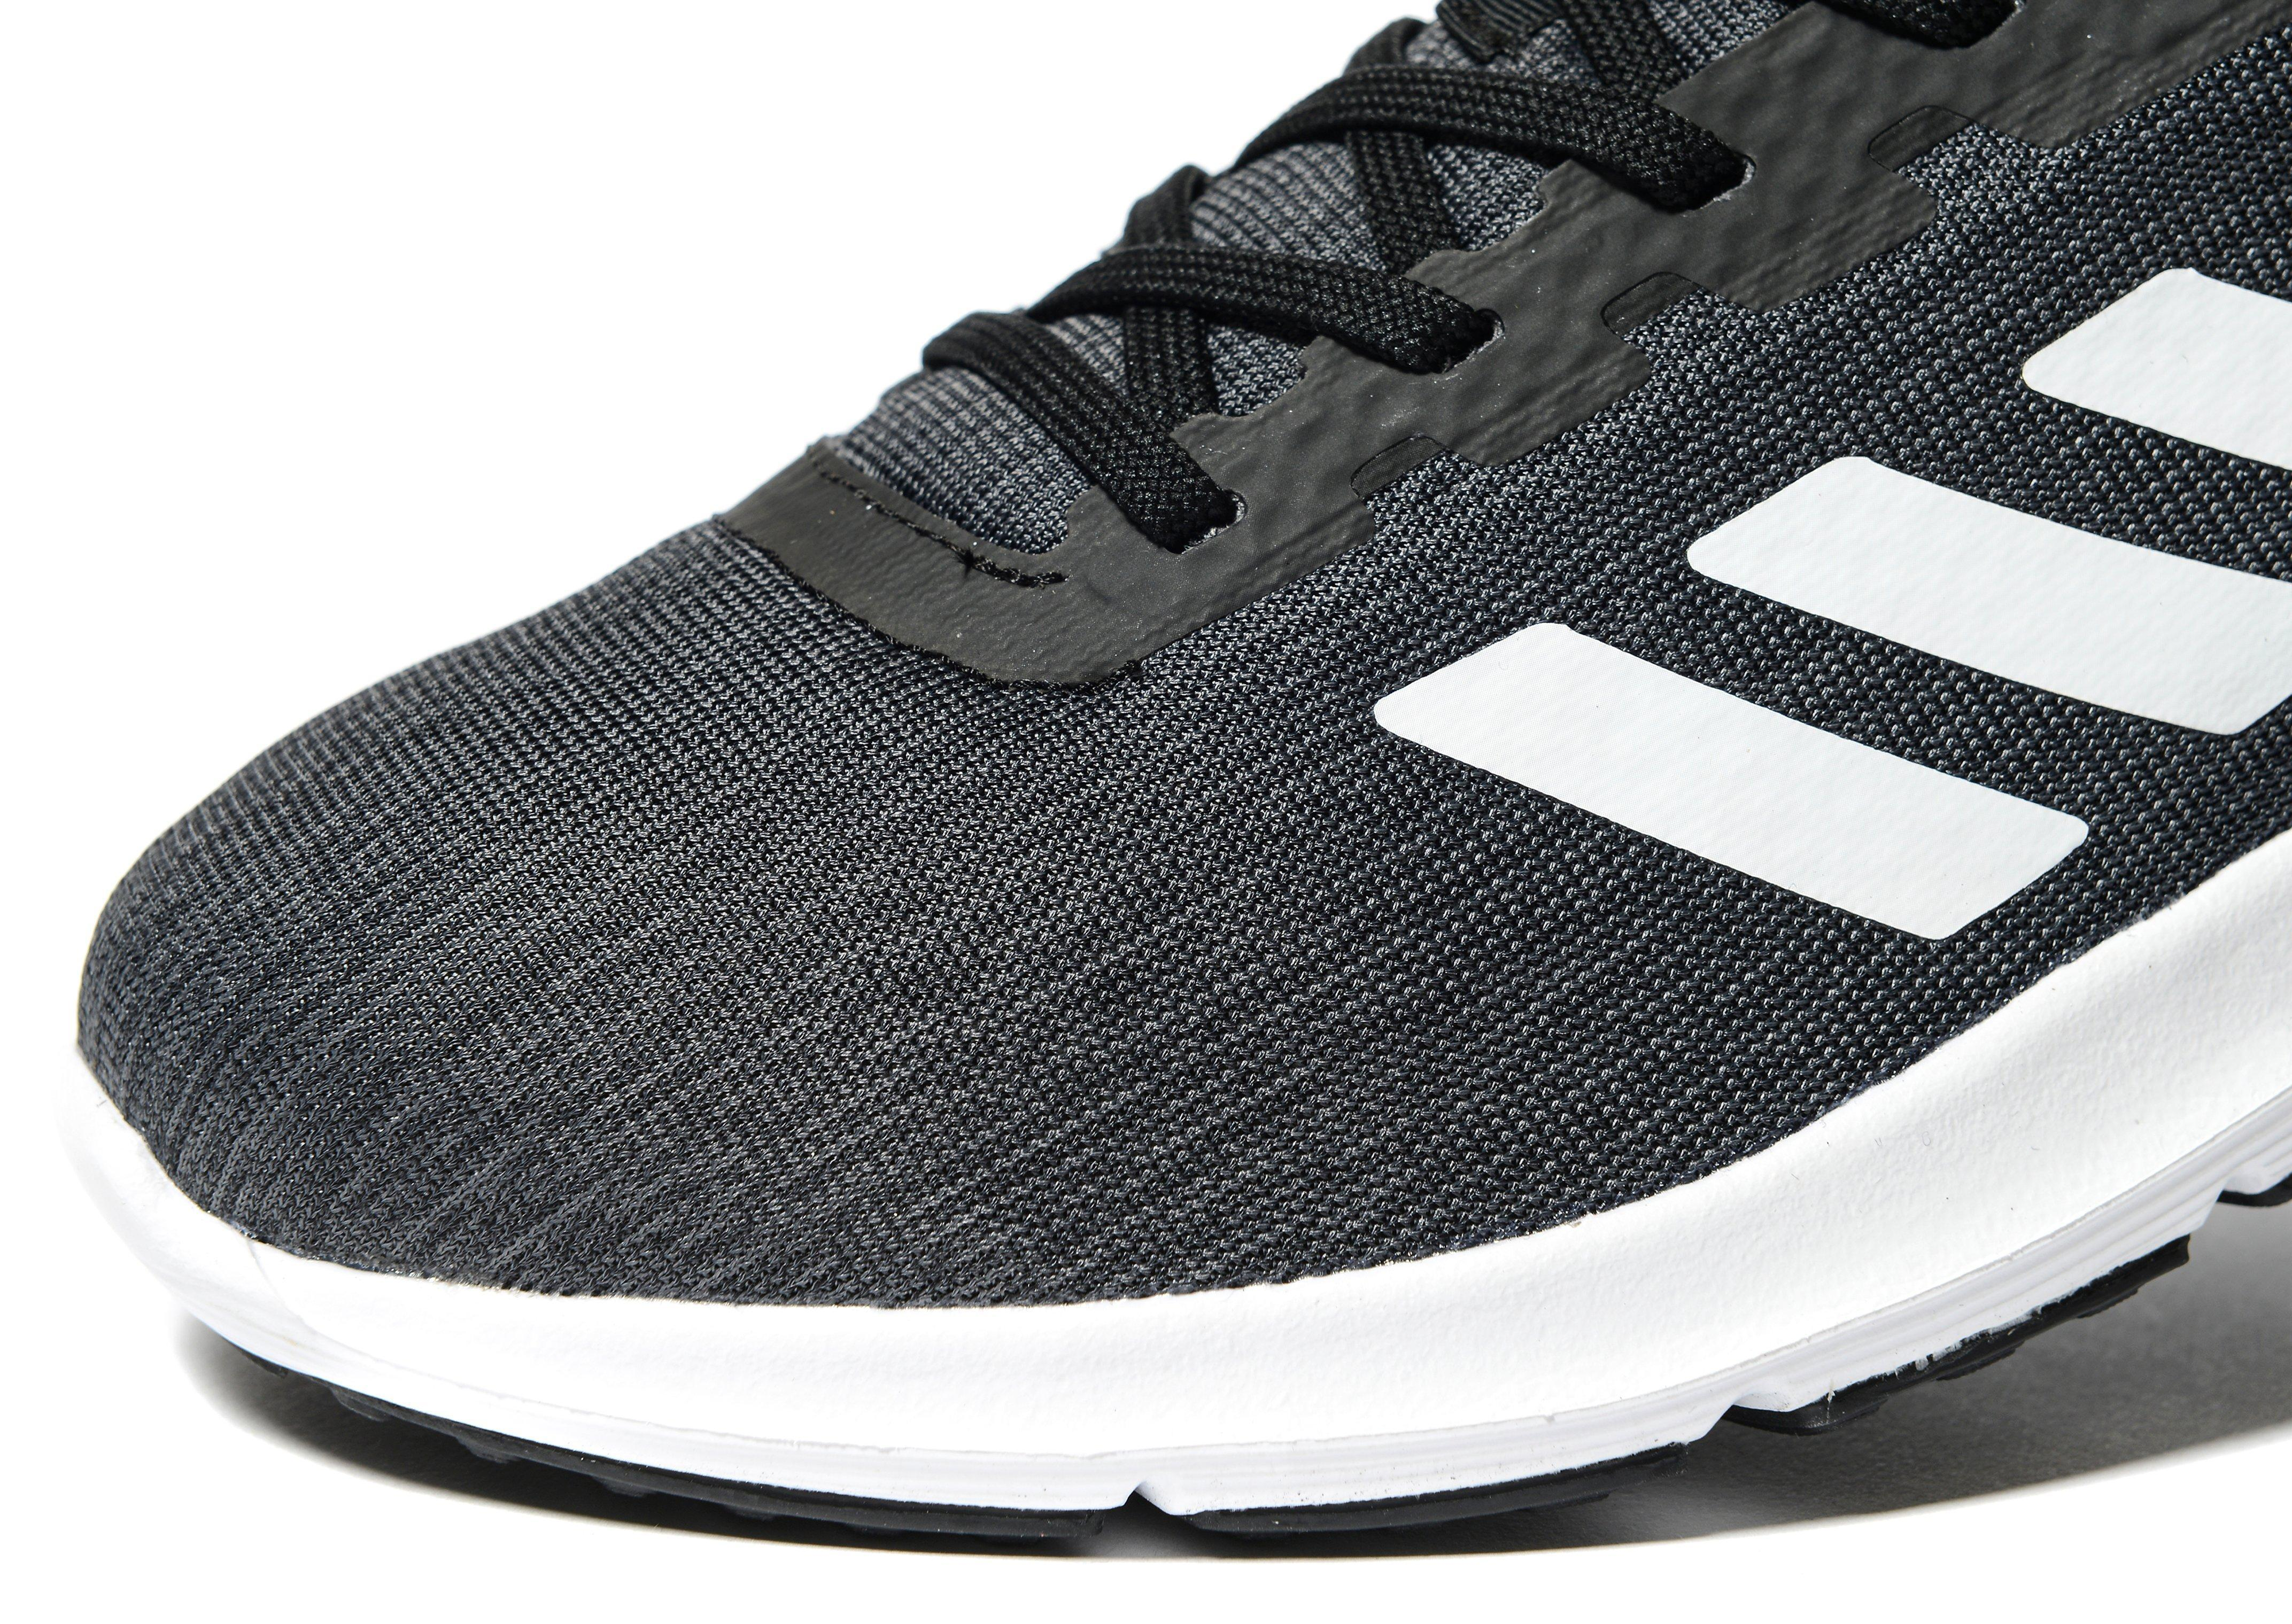 adidas Synthetic Cosmic 2 in Black/White (Black) for Men